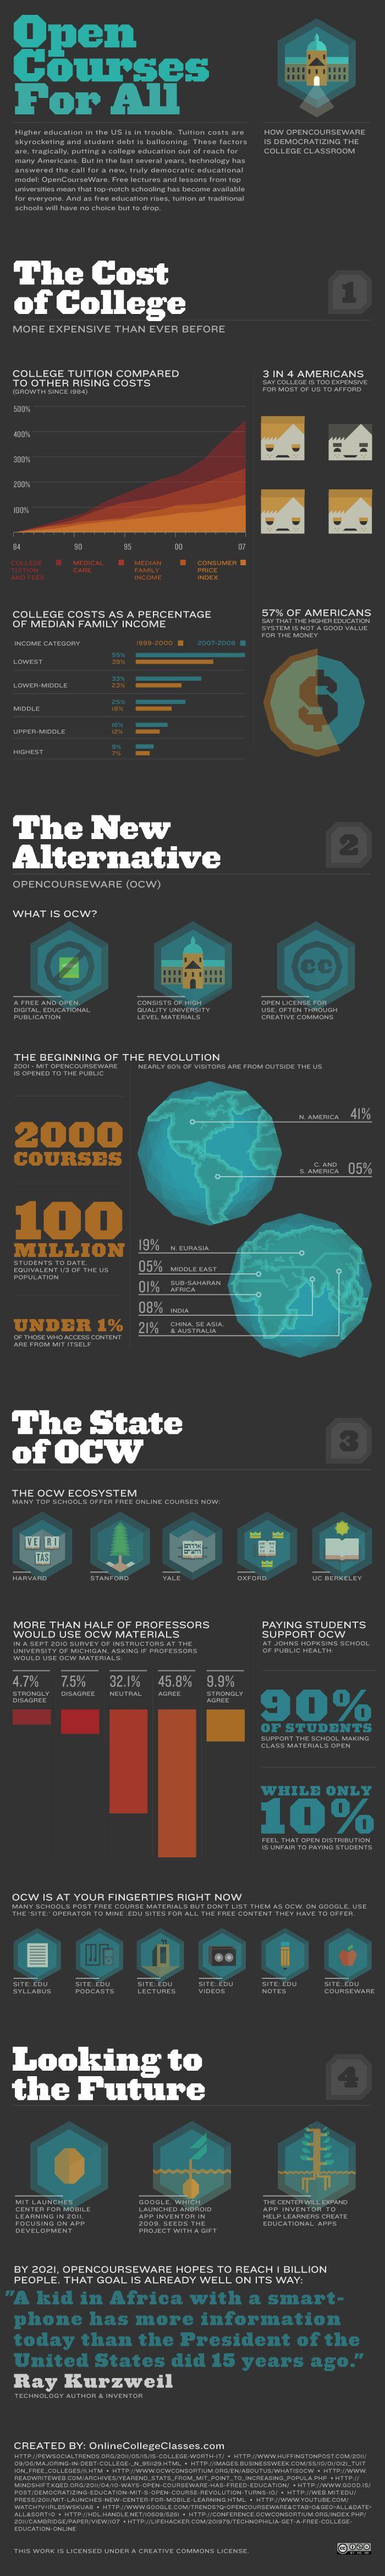 OpenCourseWare Open Courses fo